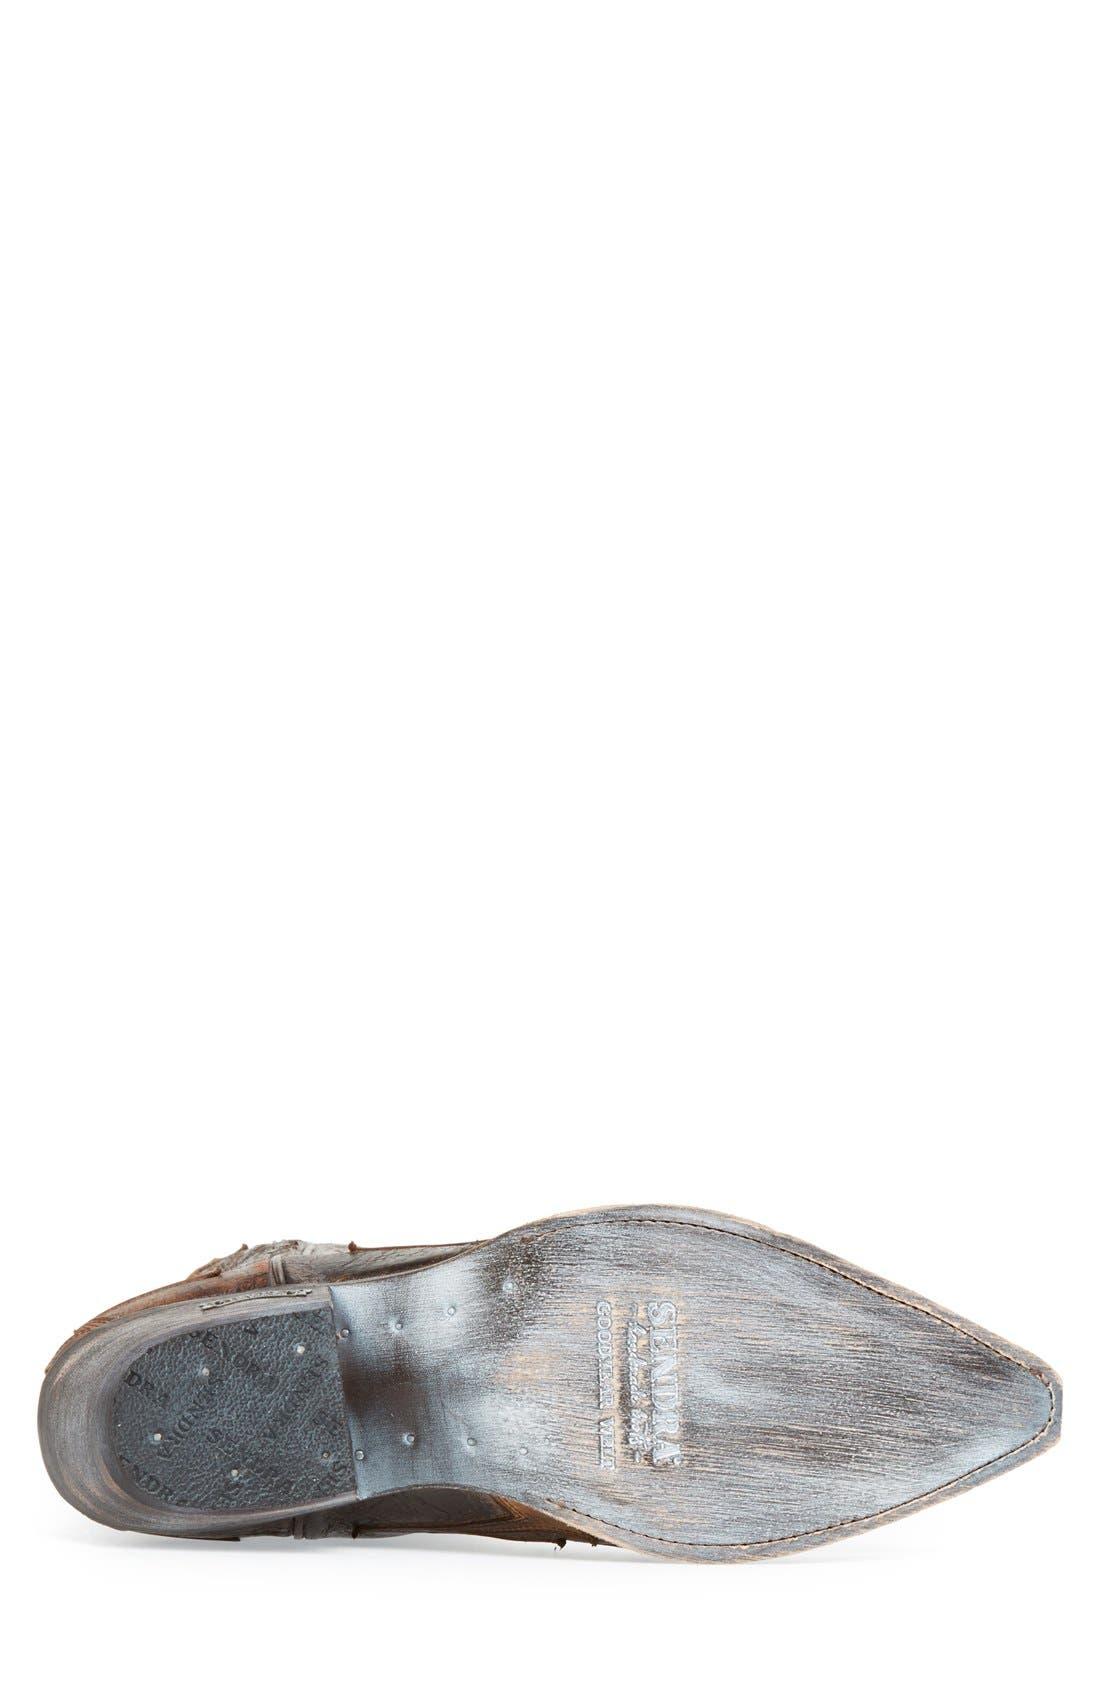 'Carson' Cowboy Boot,                             Alternate thumbnail 4, color,                             241